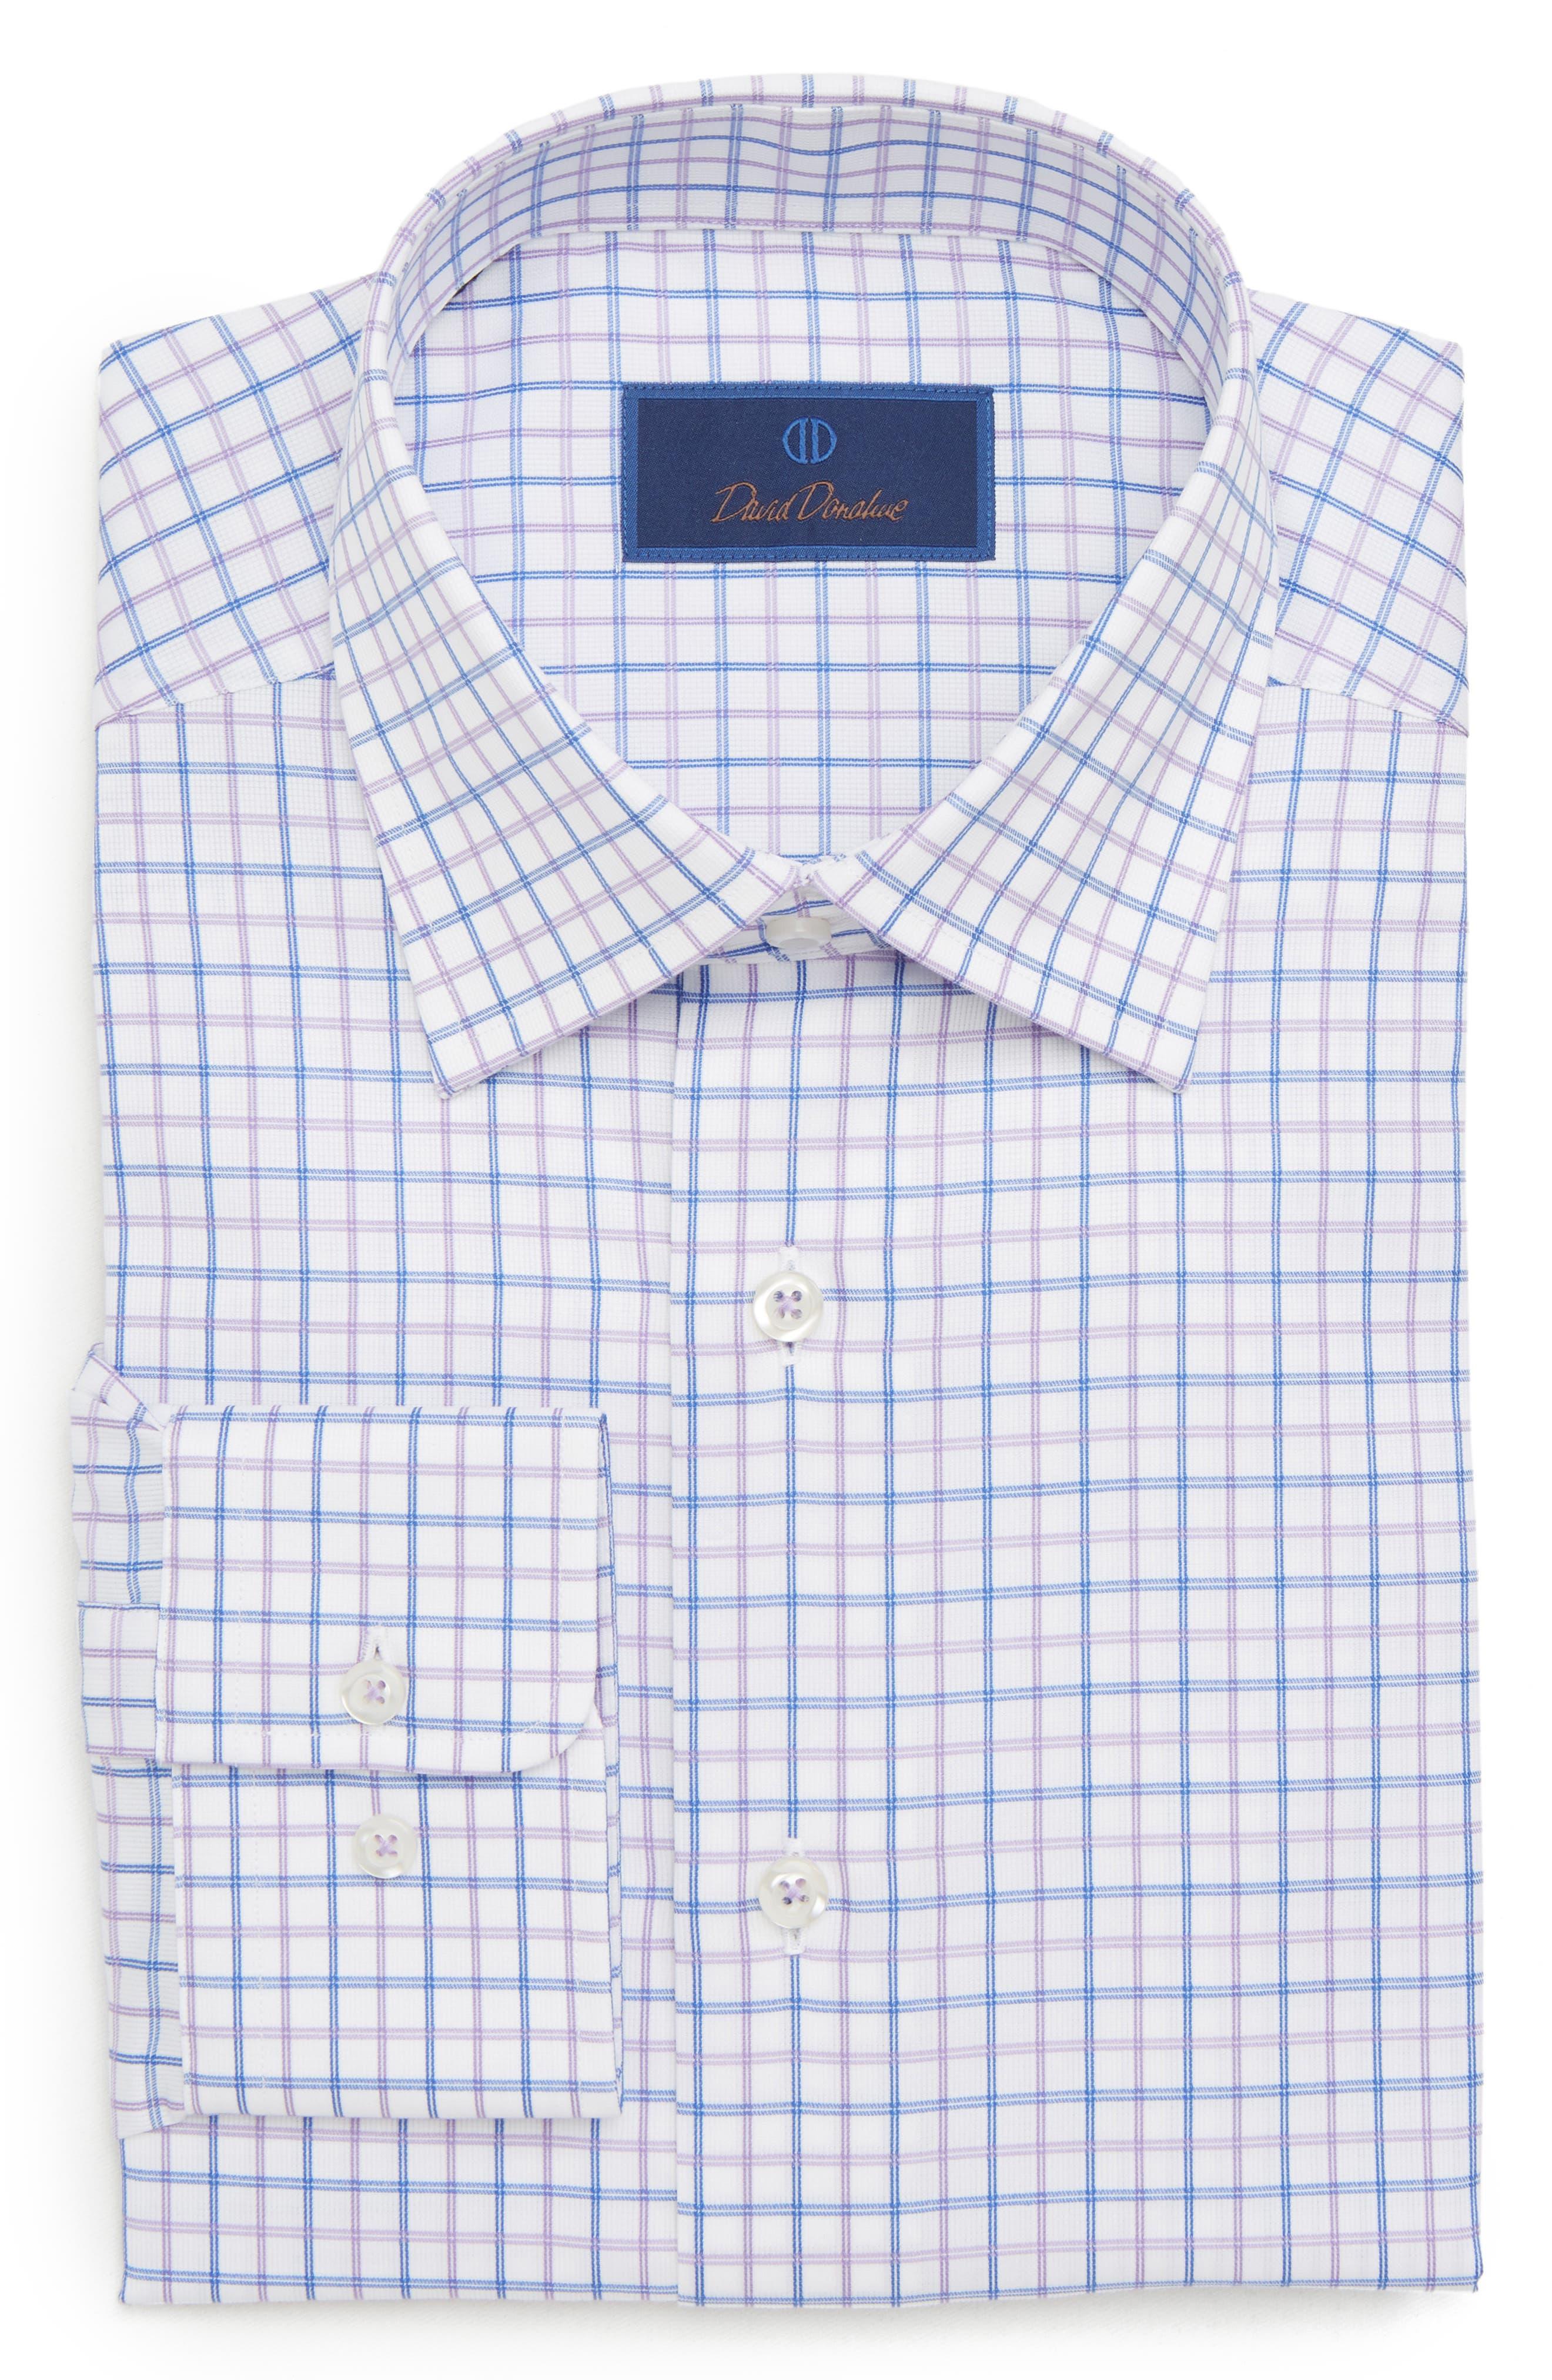 Regular Fit Check Dress Shirt,                             Alternate thumbnail 5, color,                             534